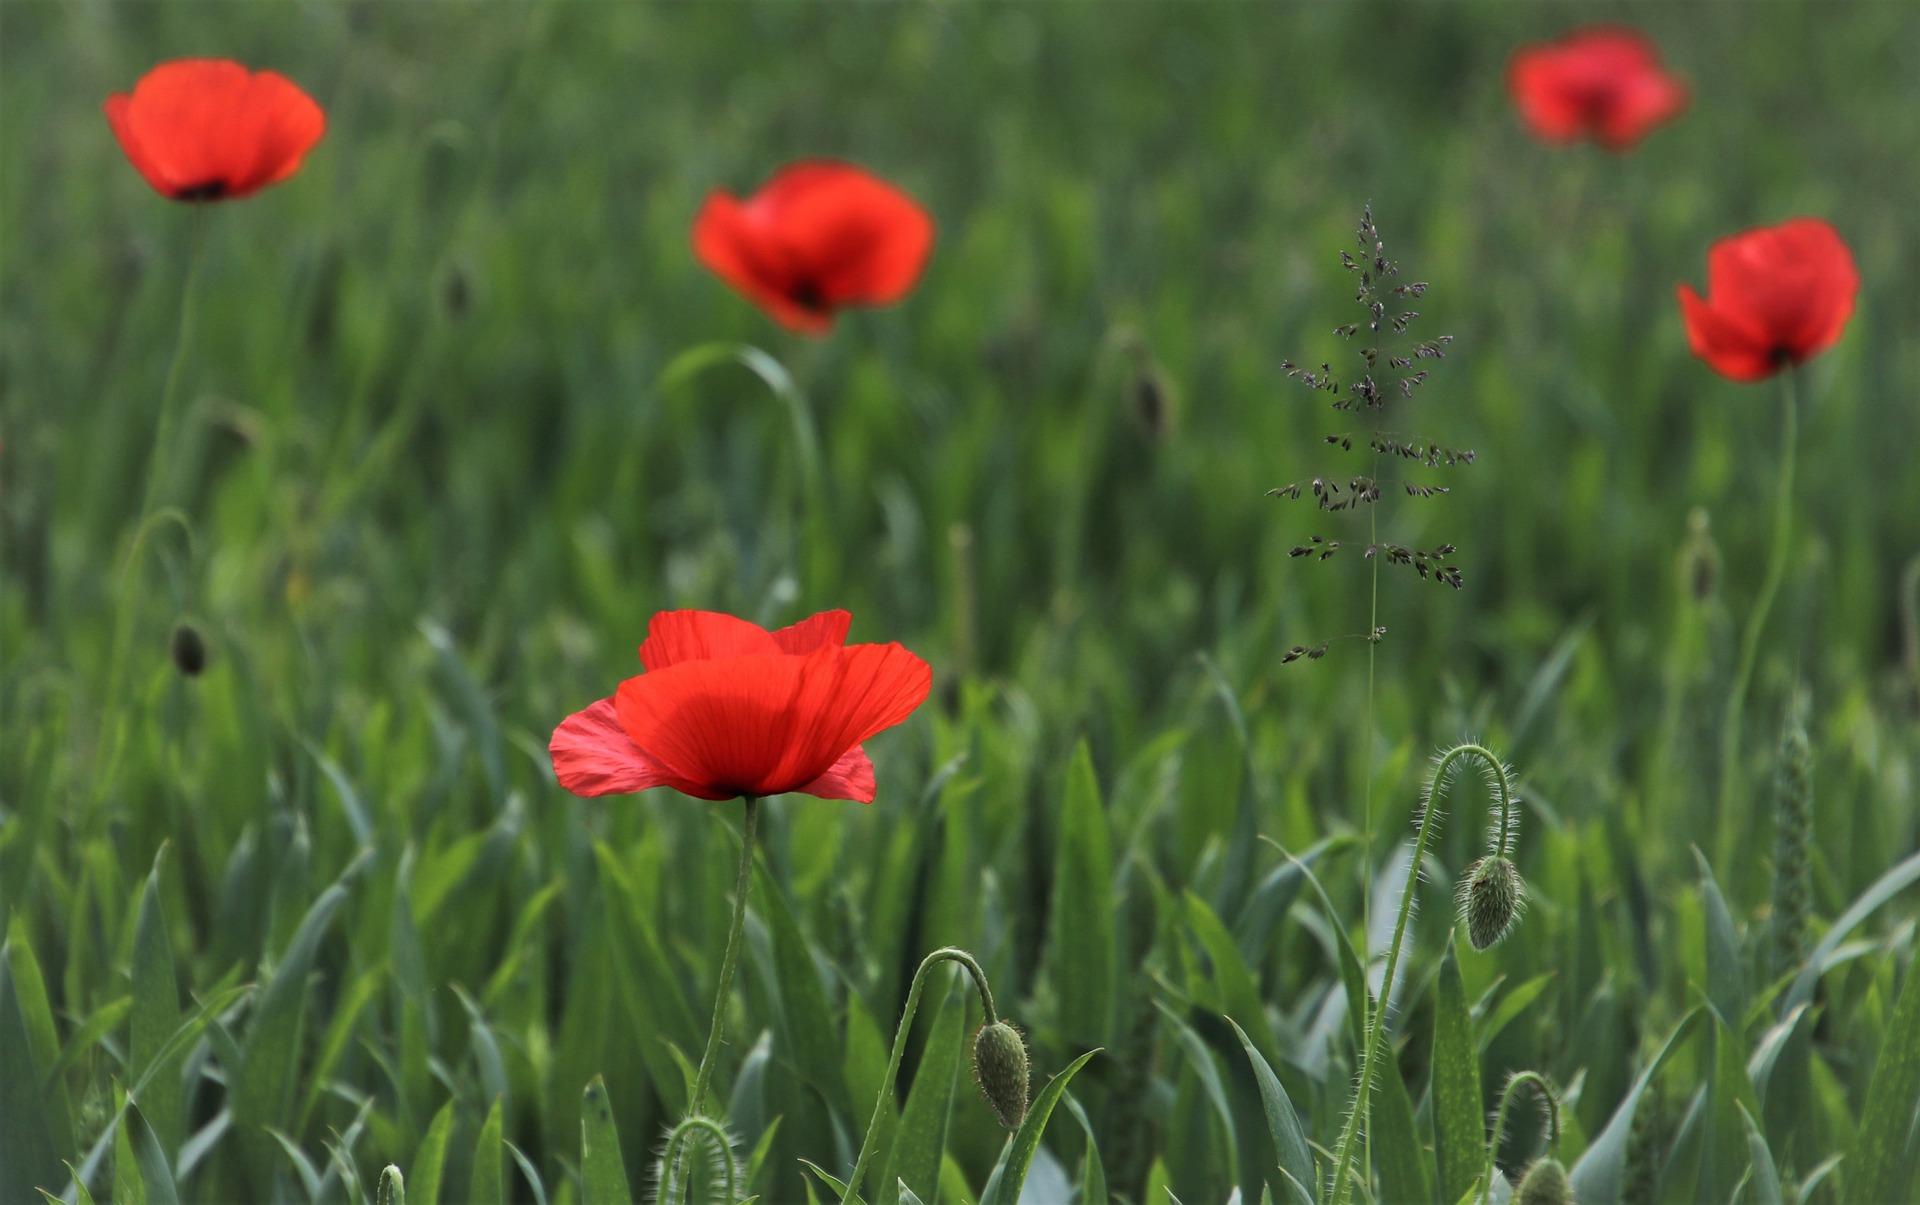 Pflanze des Monats: Klatschmohn - der rote Bienenmagnet